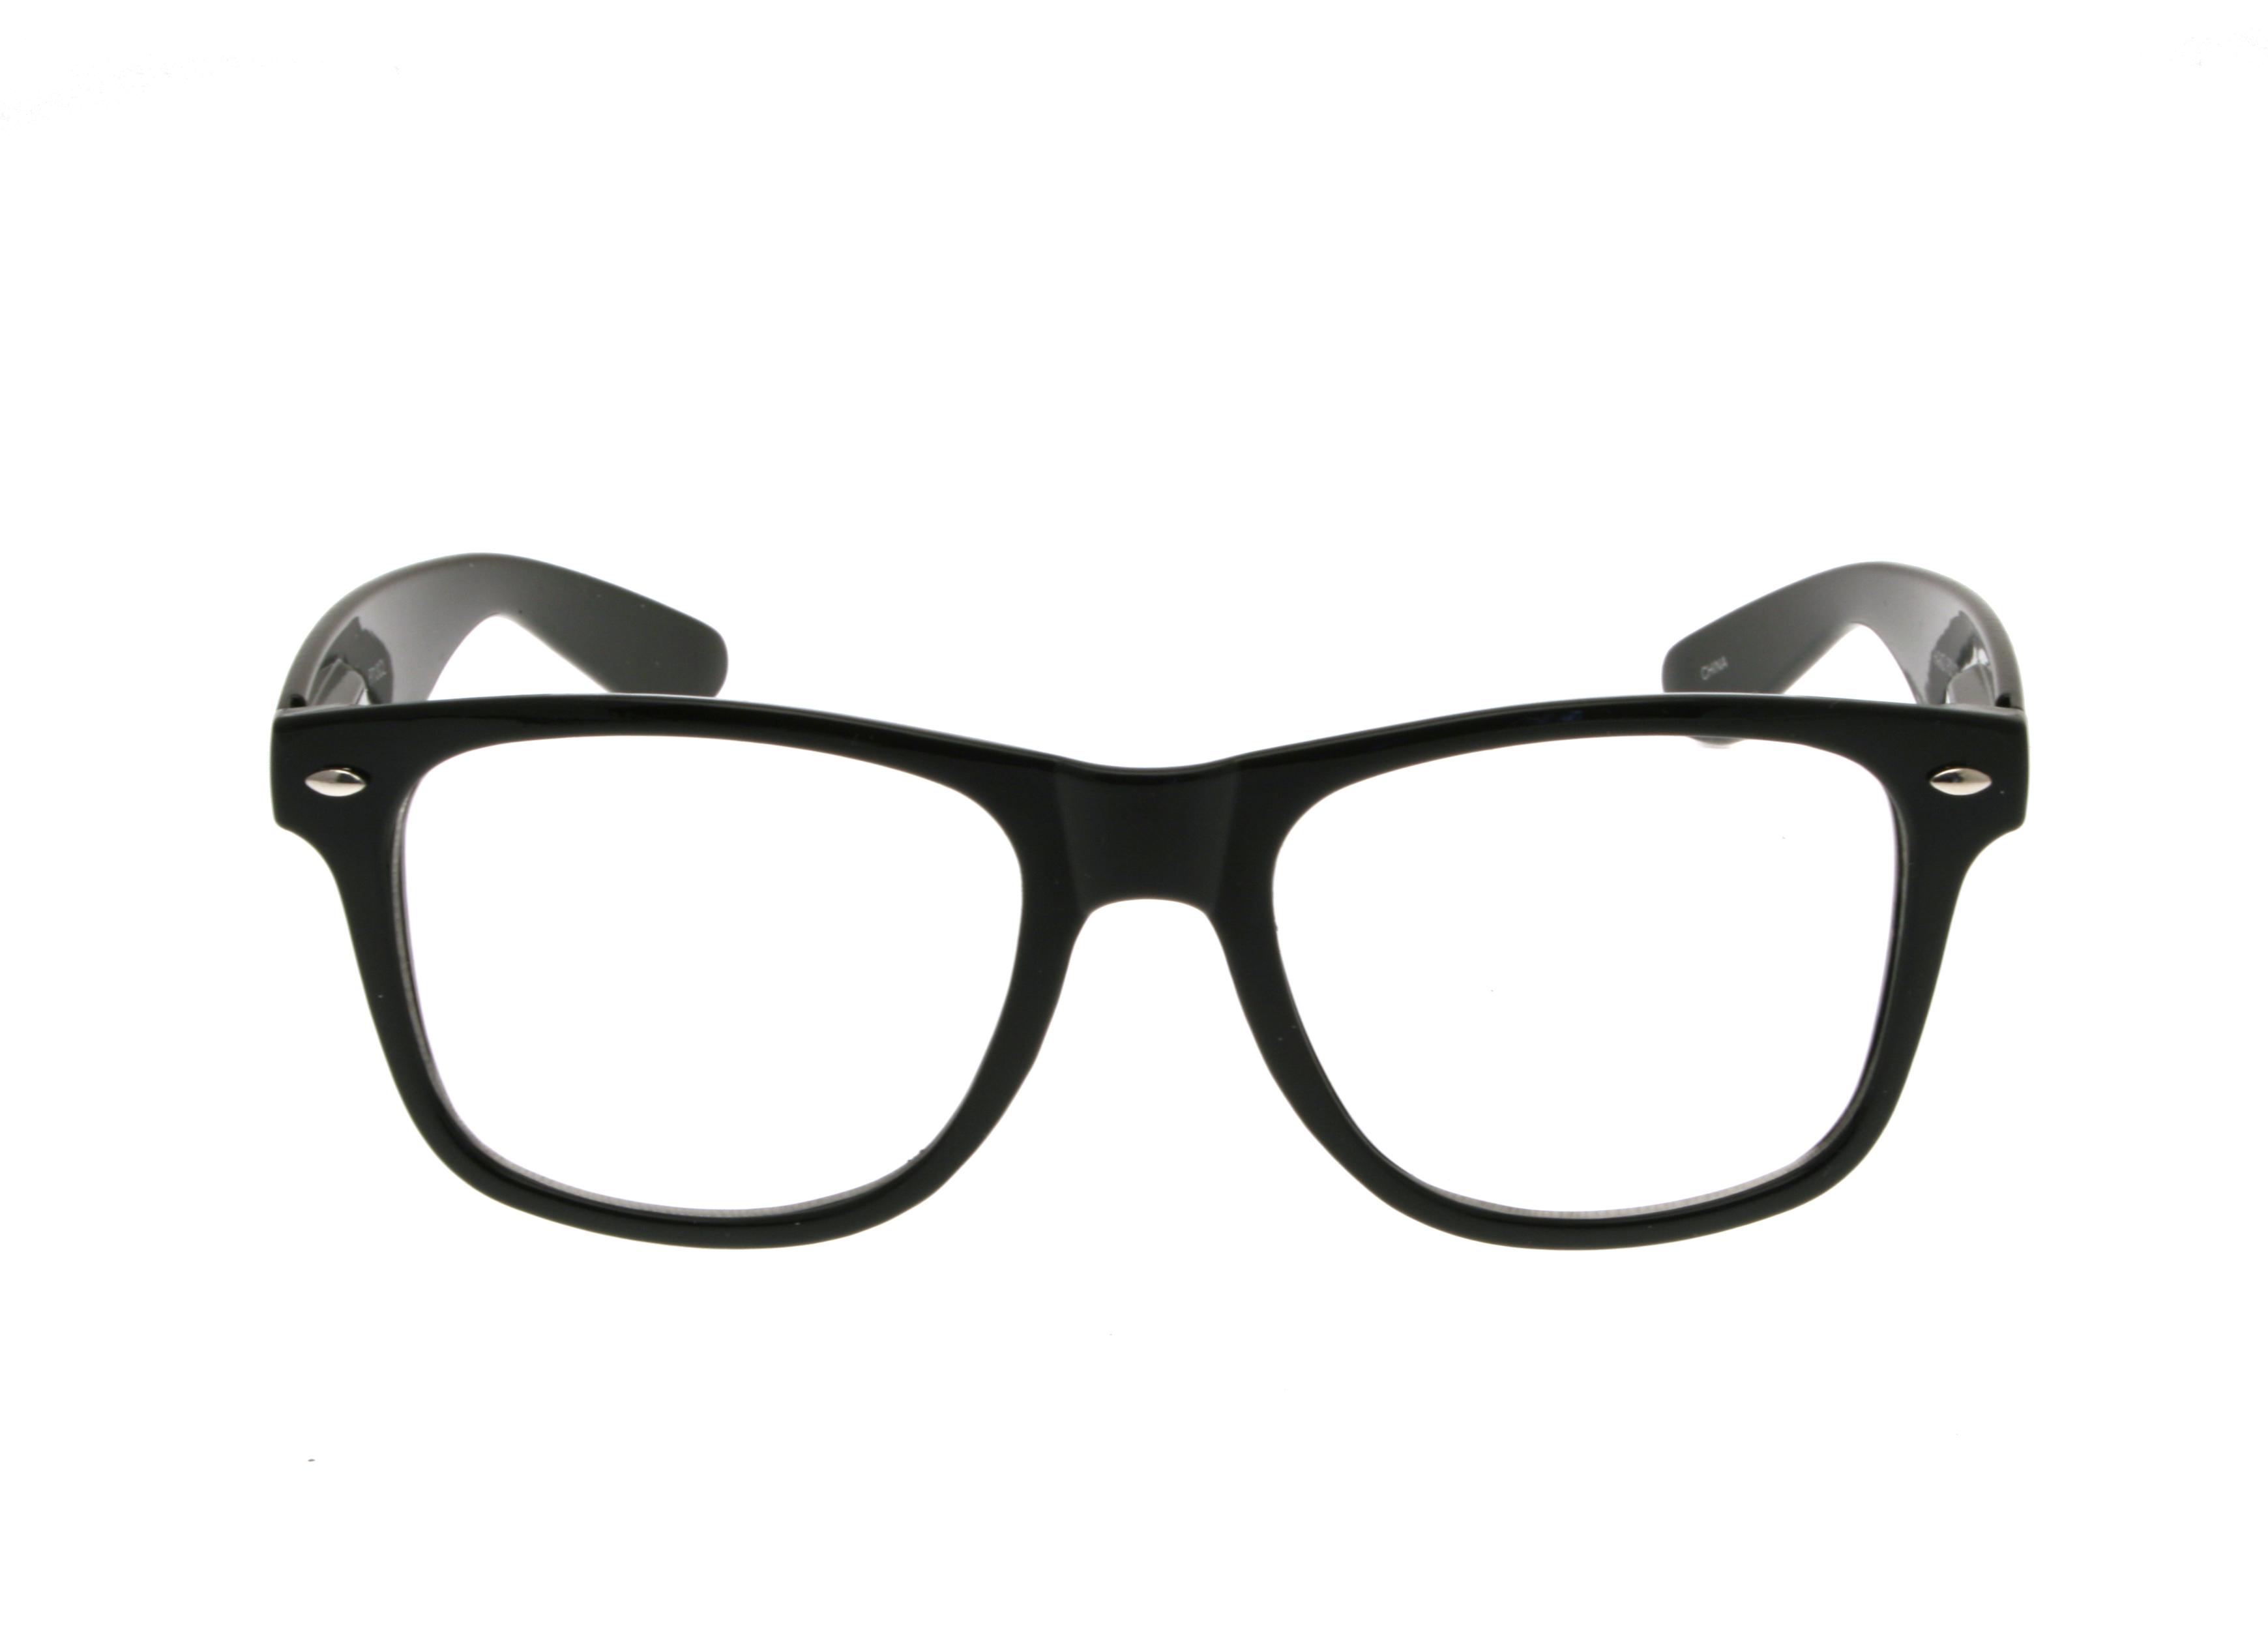 3479x2500 Nerd Glasses Clipart Images Image